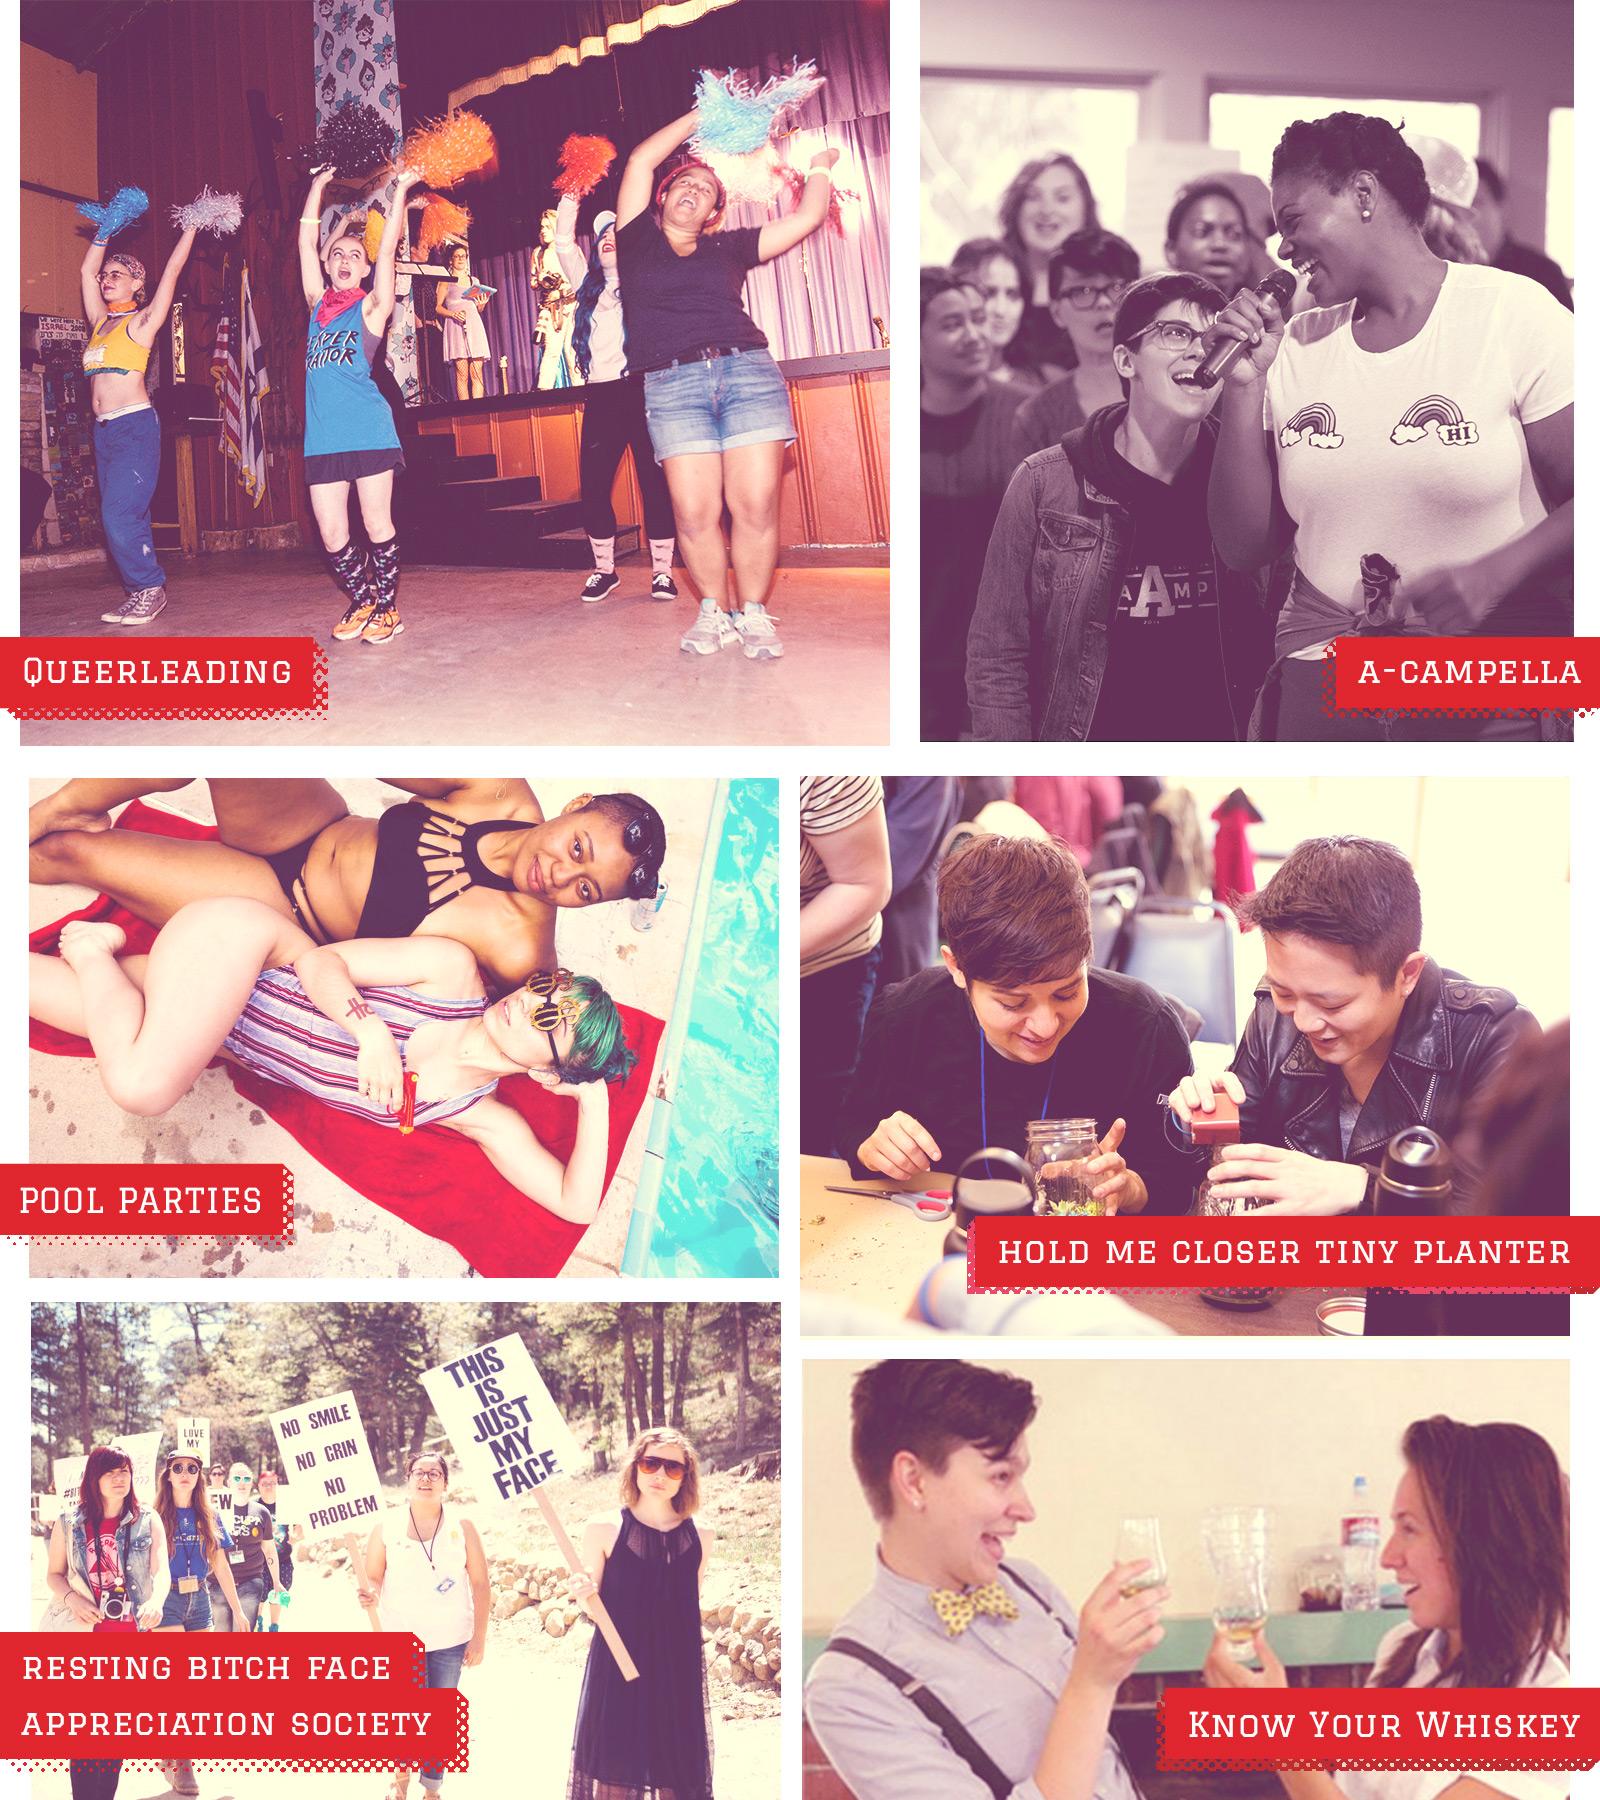 XI---Collage-Activities-Day.jpg